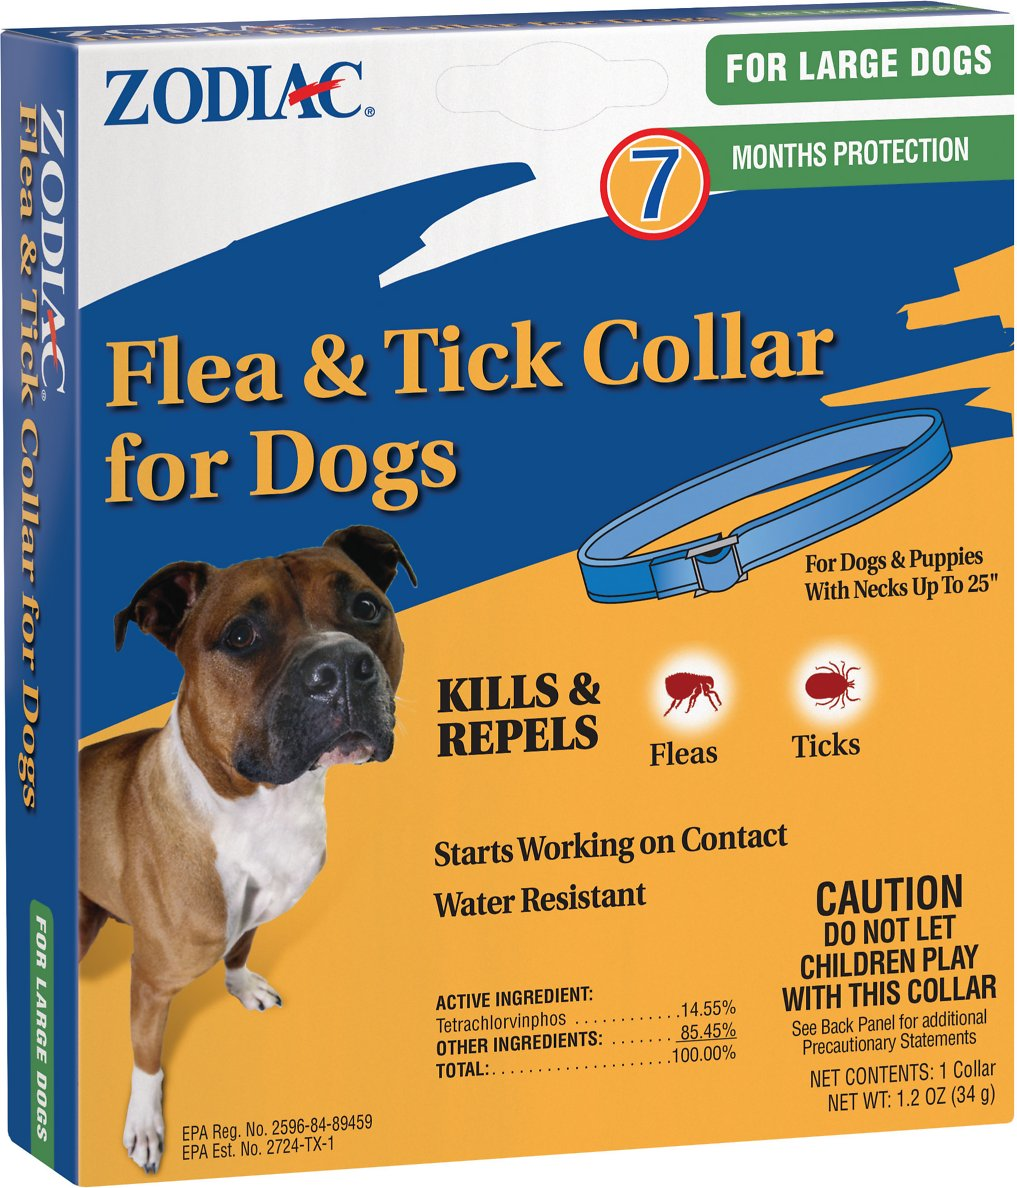 Zodiac Flea & Tick Collar for Large Dogs, 25-in